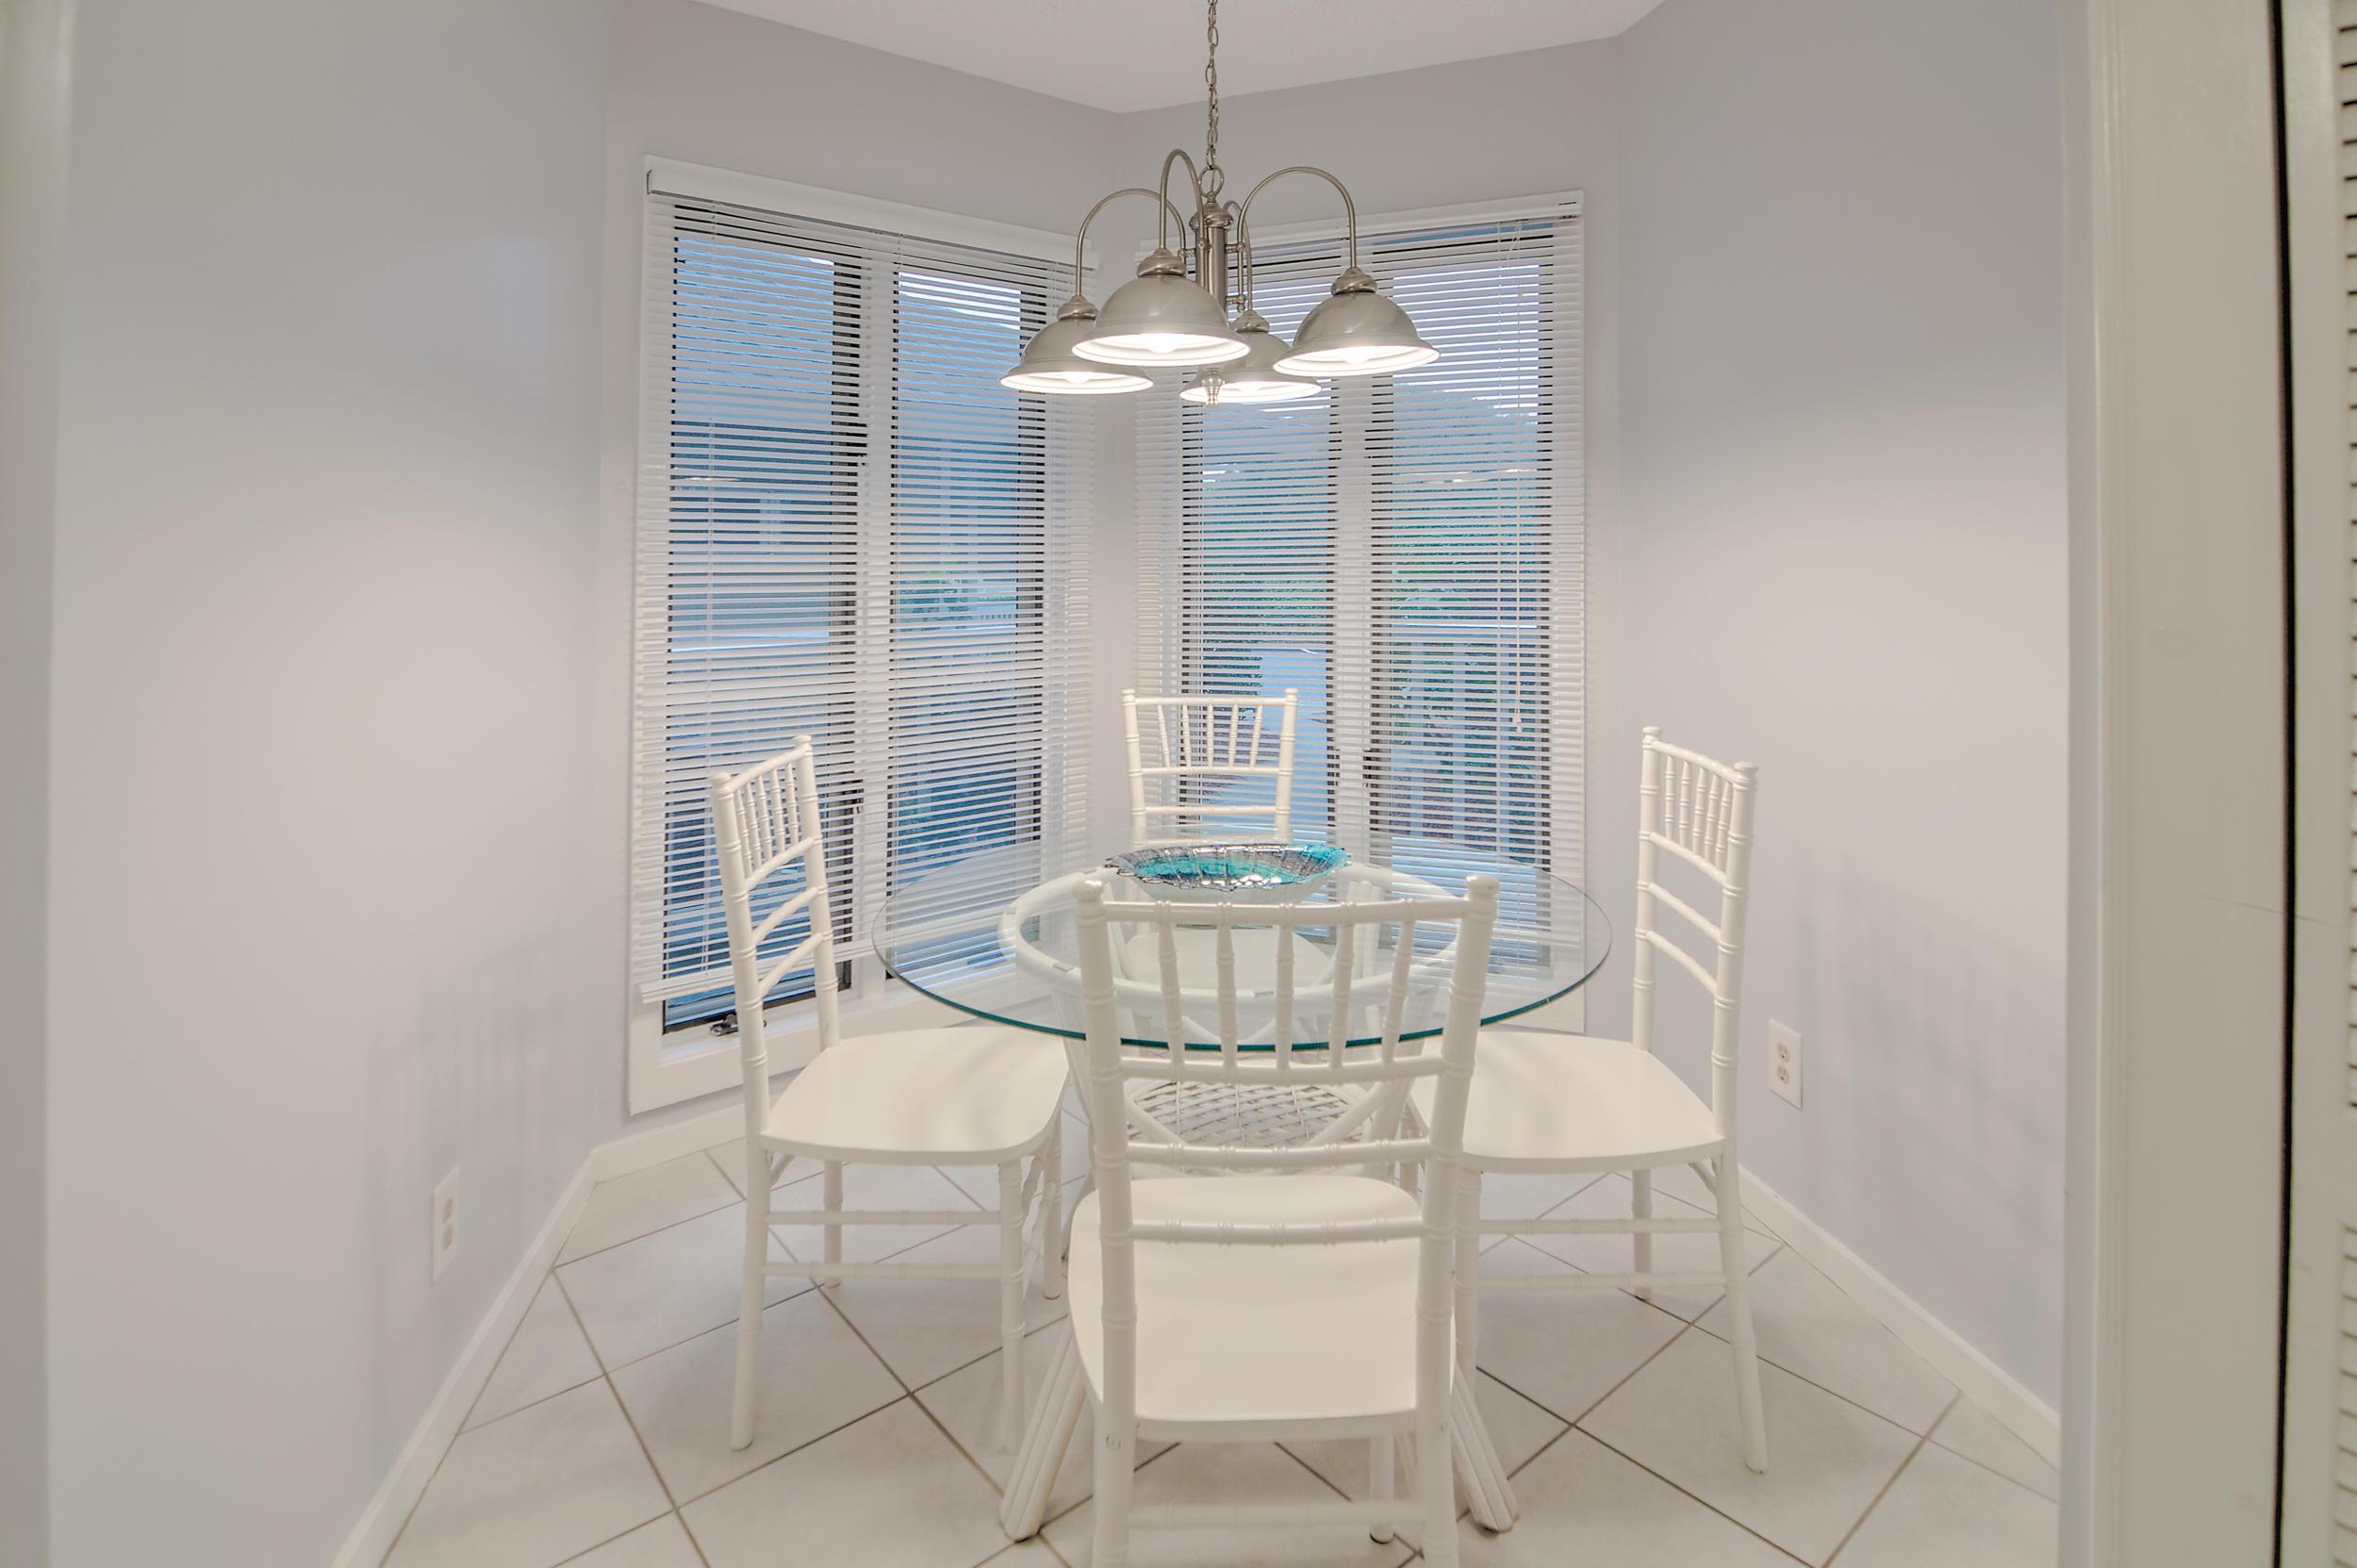 Port Ocall Homes For Sale - 103 Port O Call, Isle of Palms, SC - 6